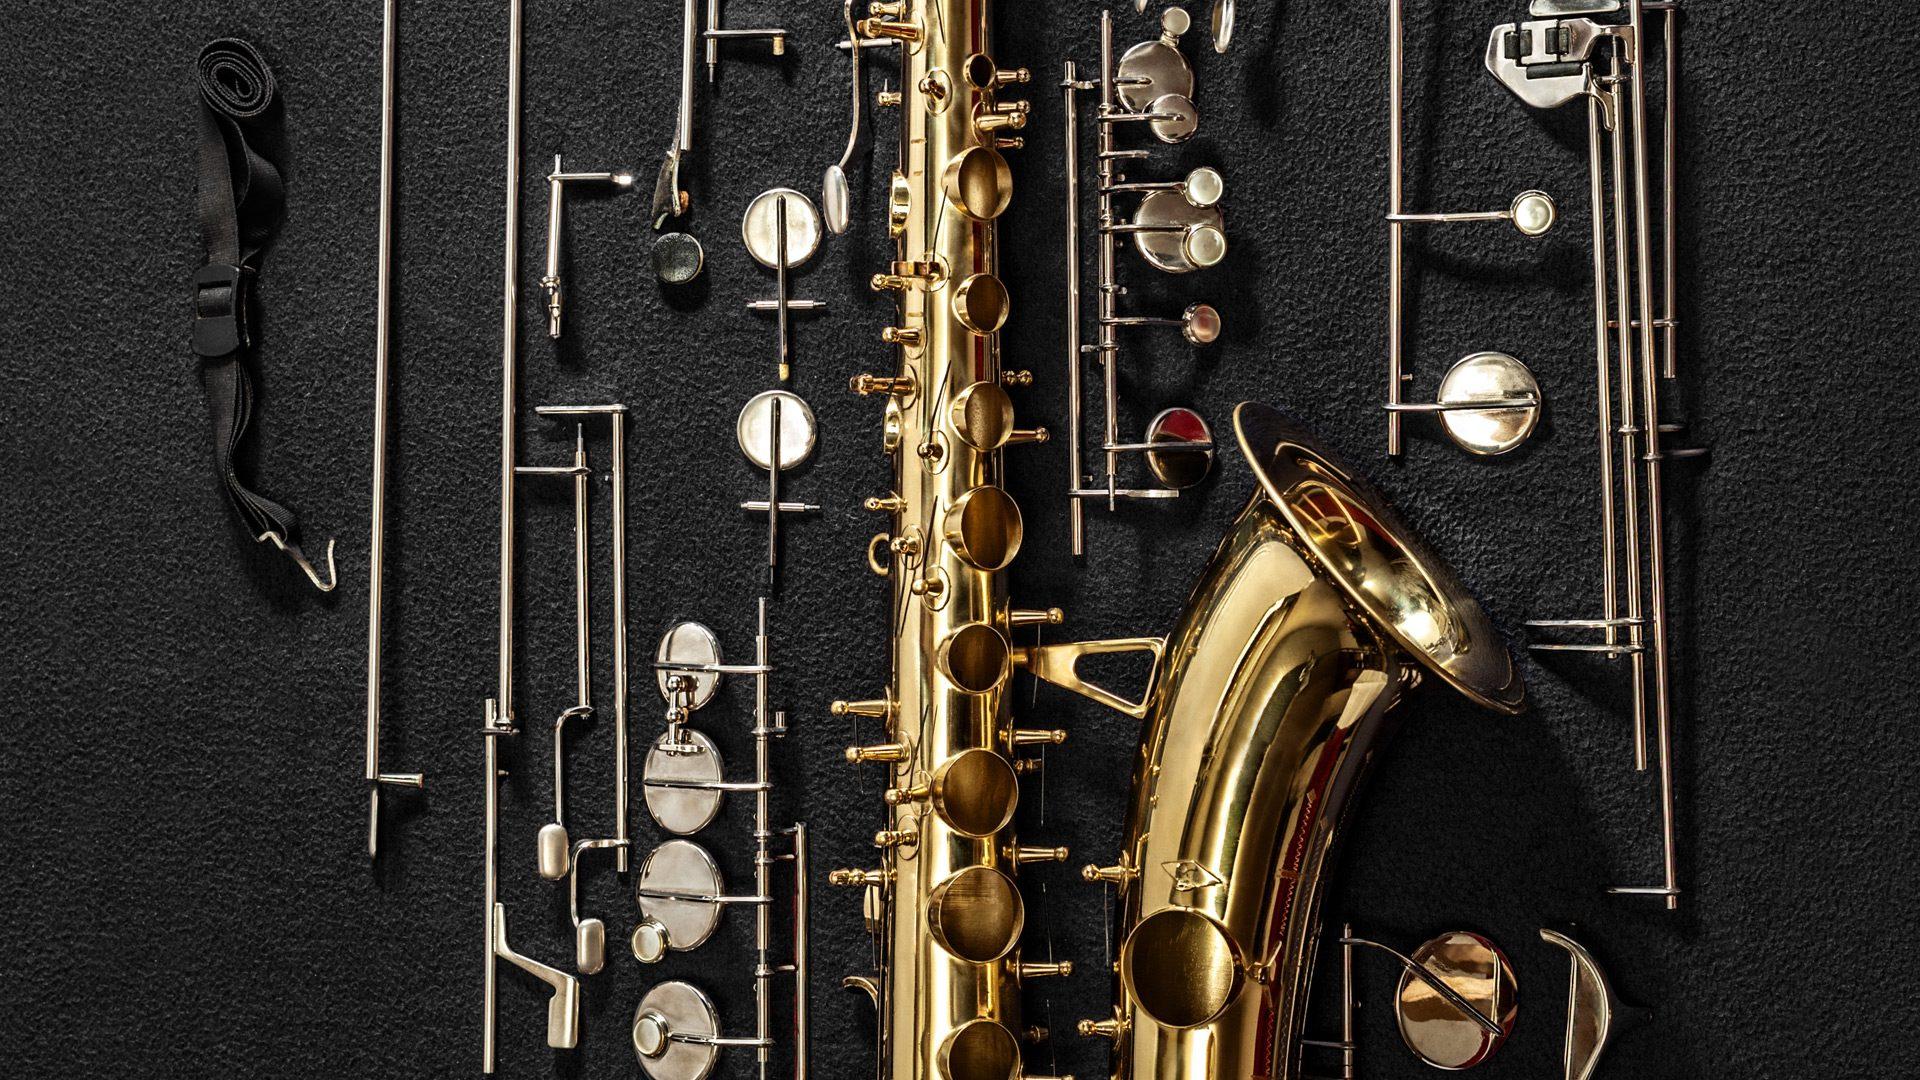 20180921_swam_saxophones-bg03-1920x1080